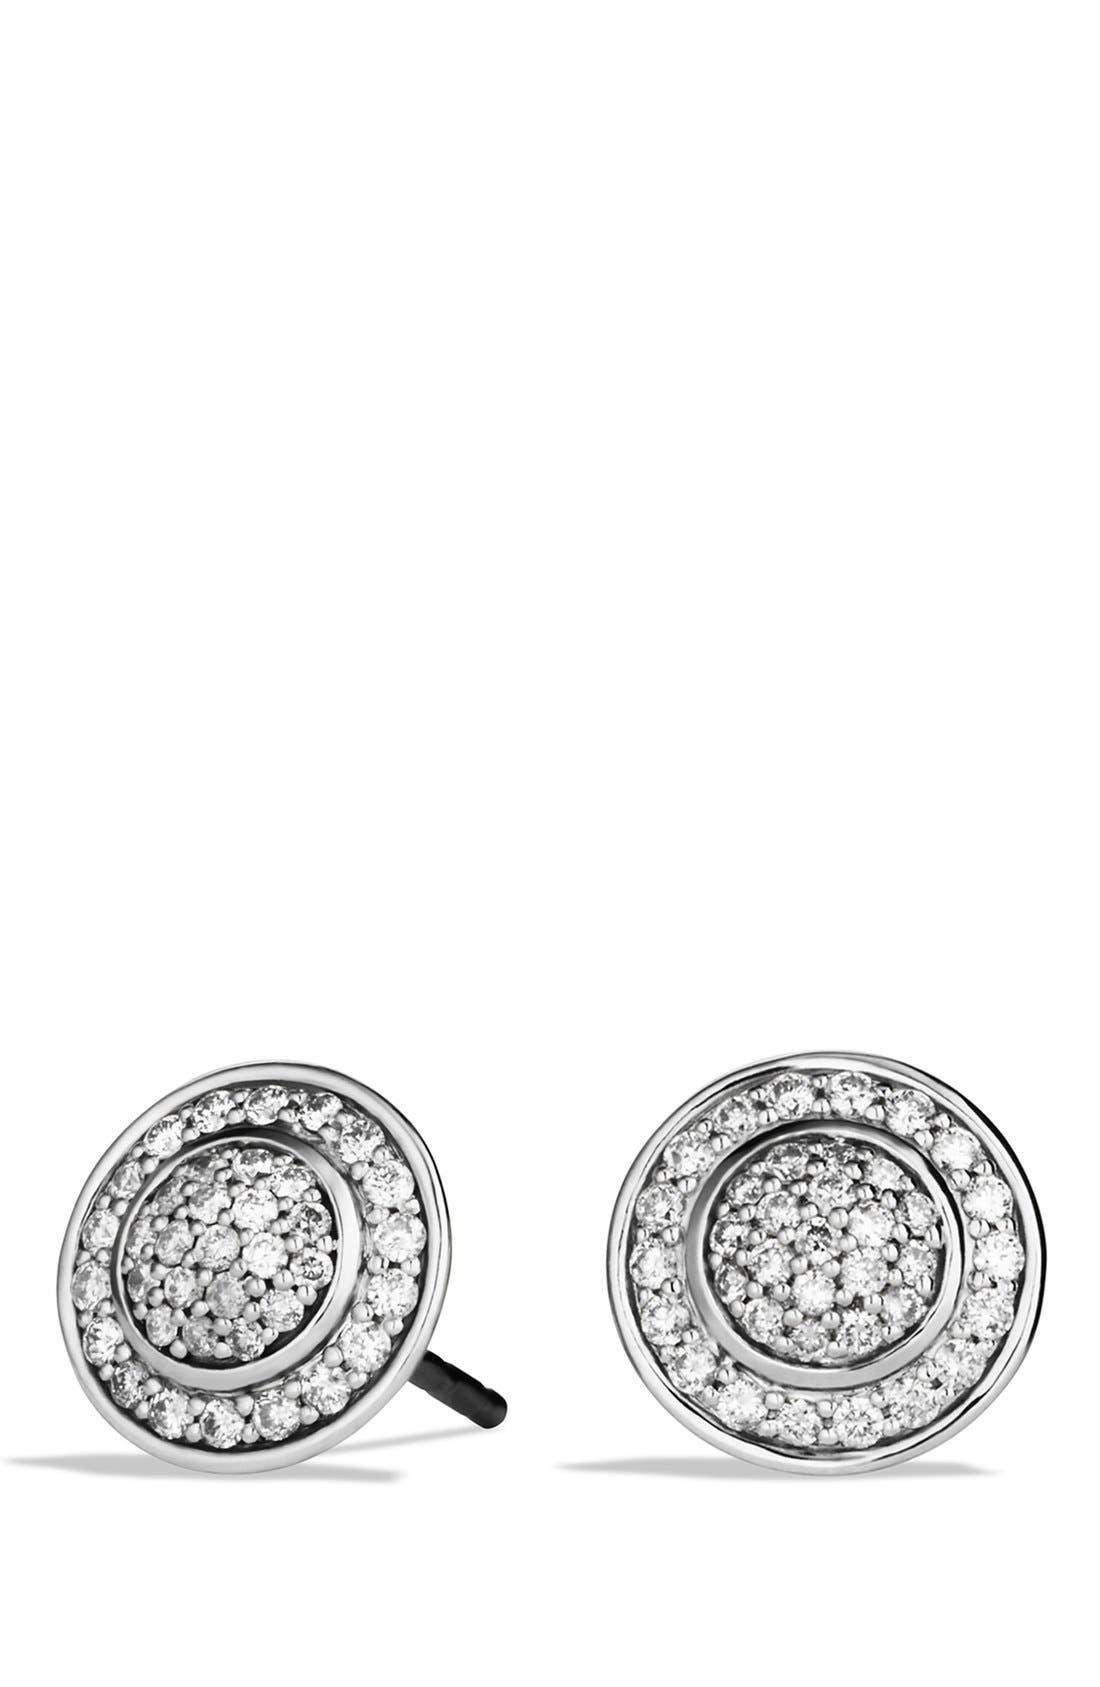 Alternate Image 1 Selected - David Yurman 'Cerise' Mini Earrings with Diamonds